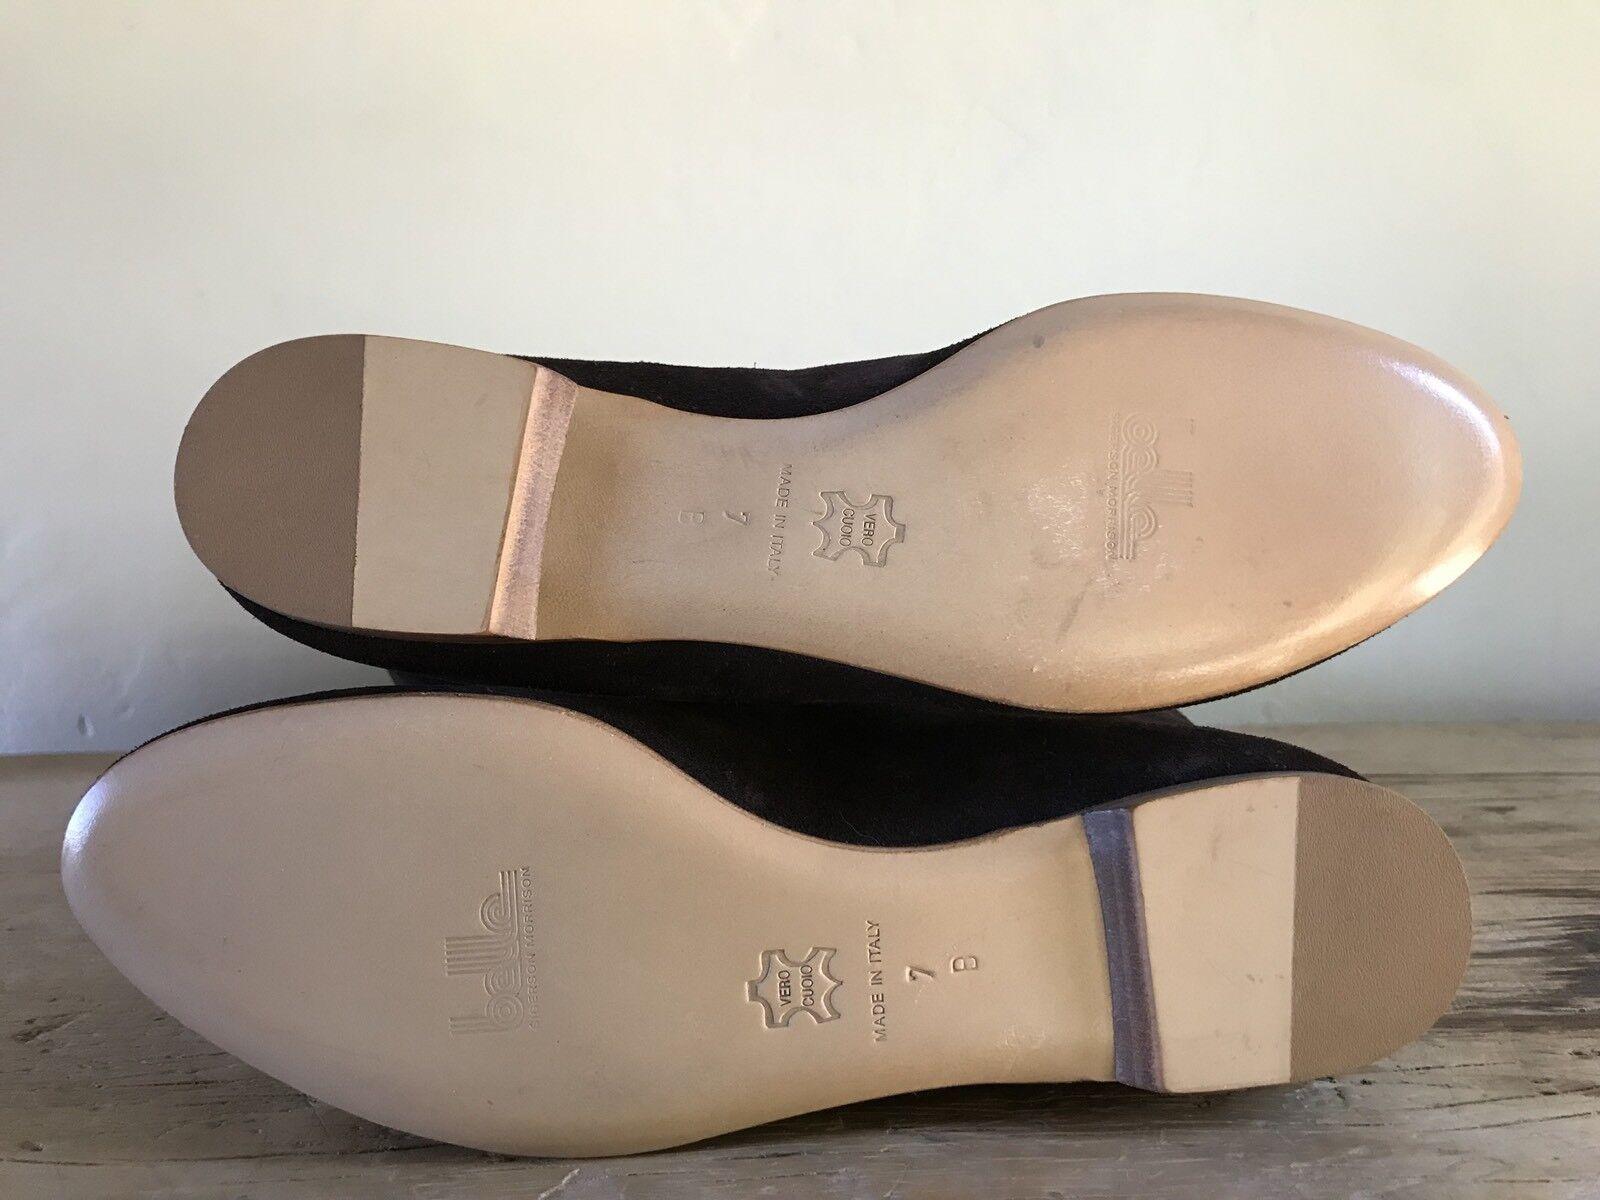 NEW  400 Belle Belle Belle by Sigerson Morrison Flat Dark braun Suede Leather Stiefel schuhe 37 c9c65d